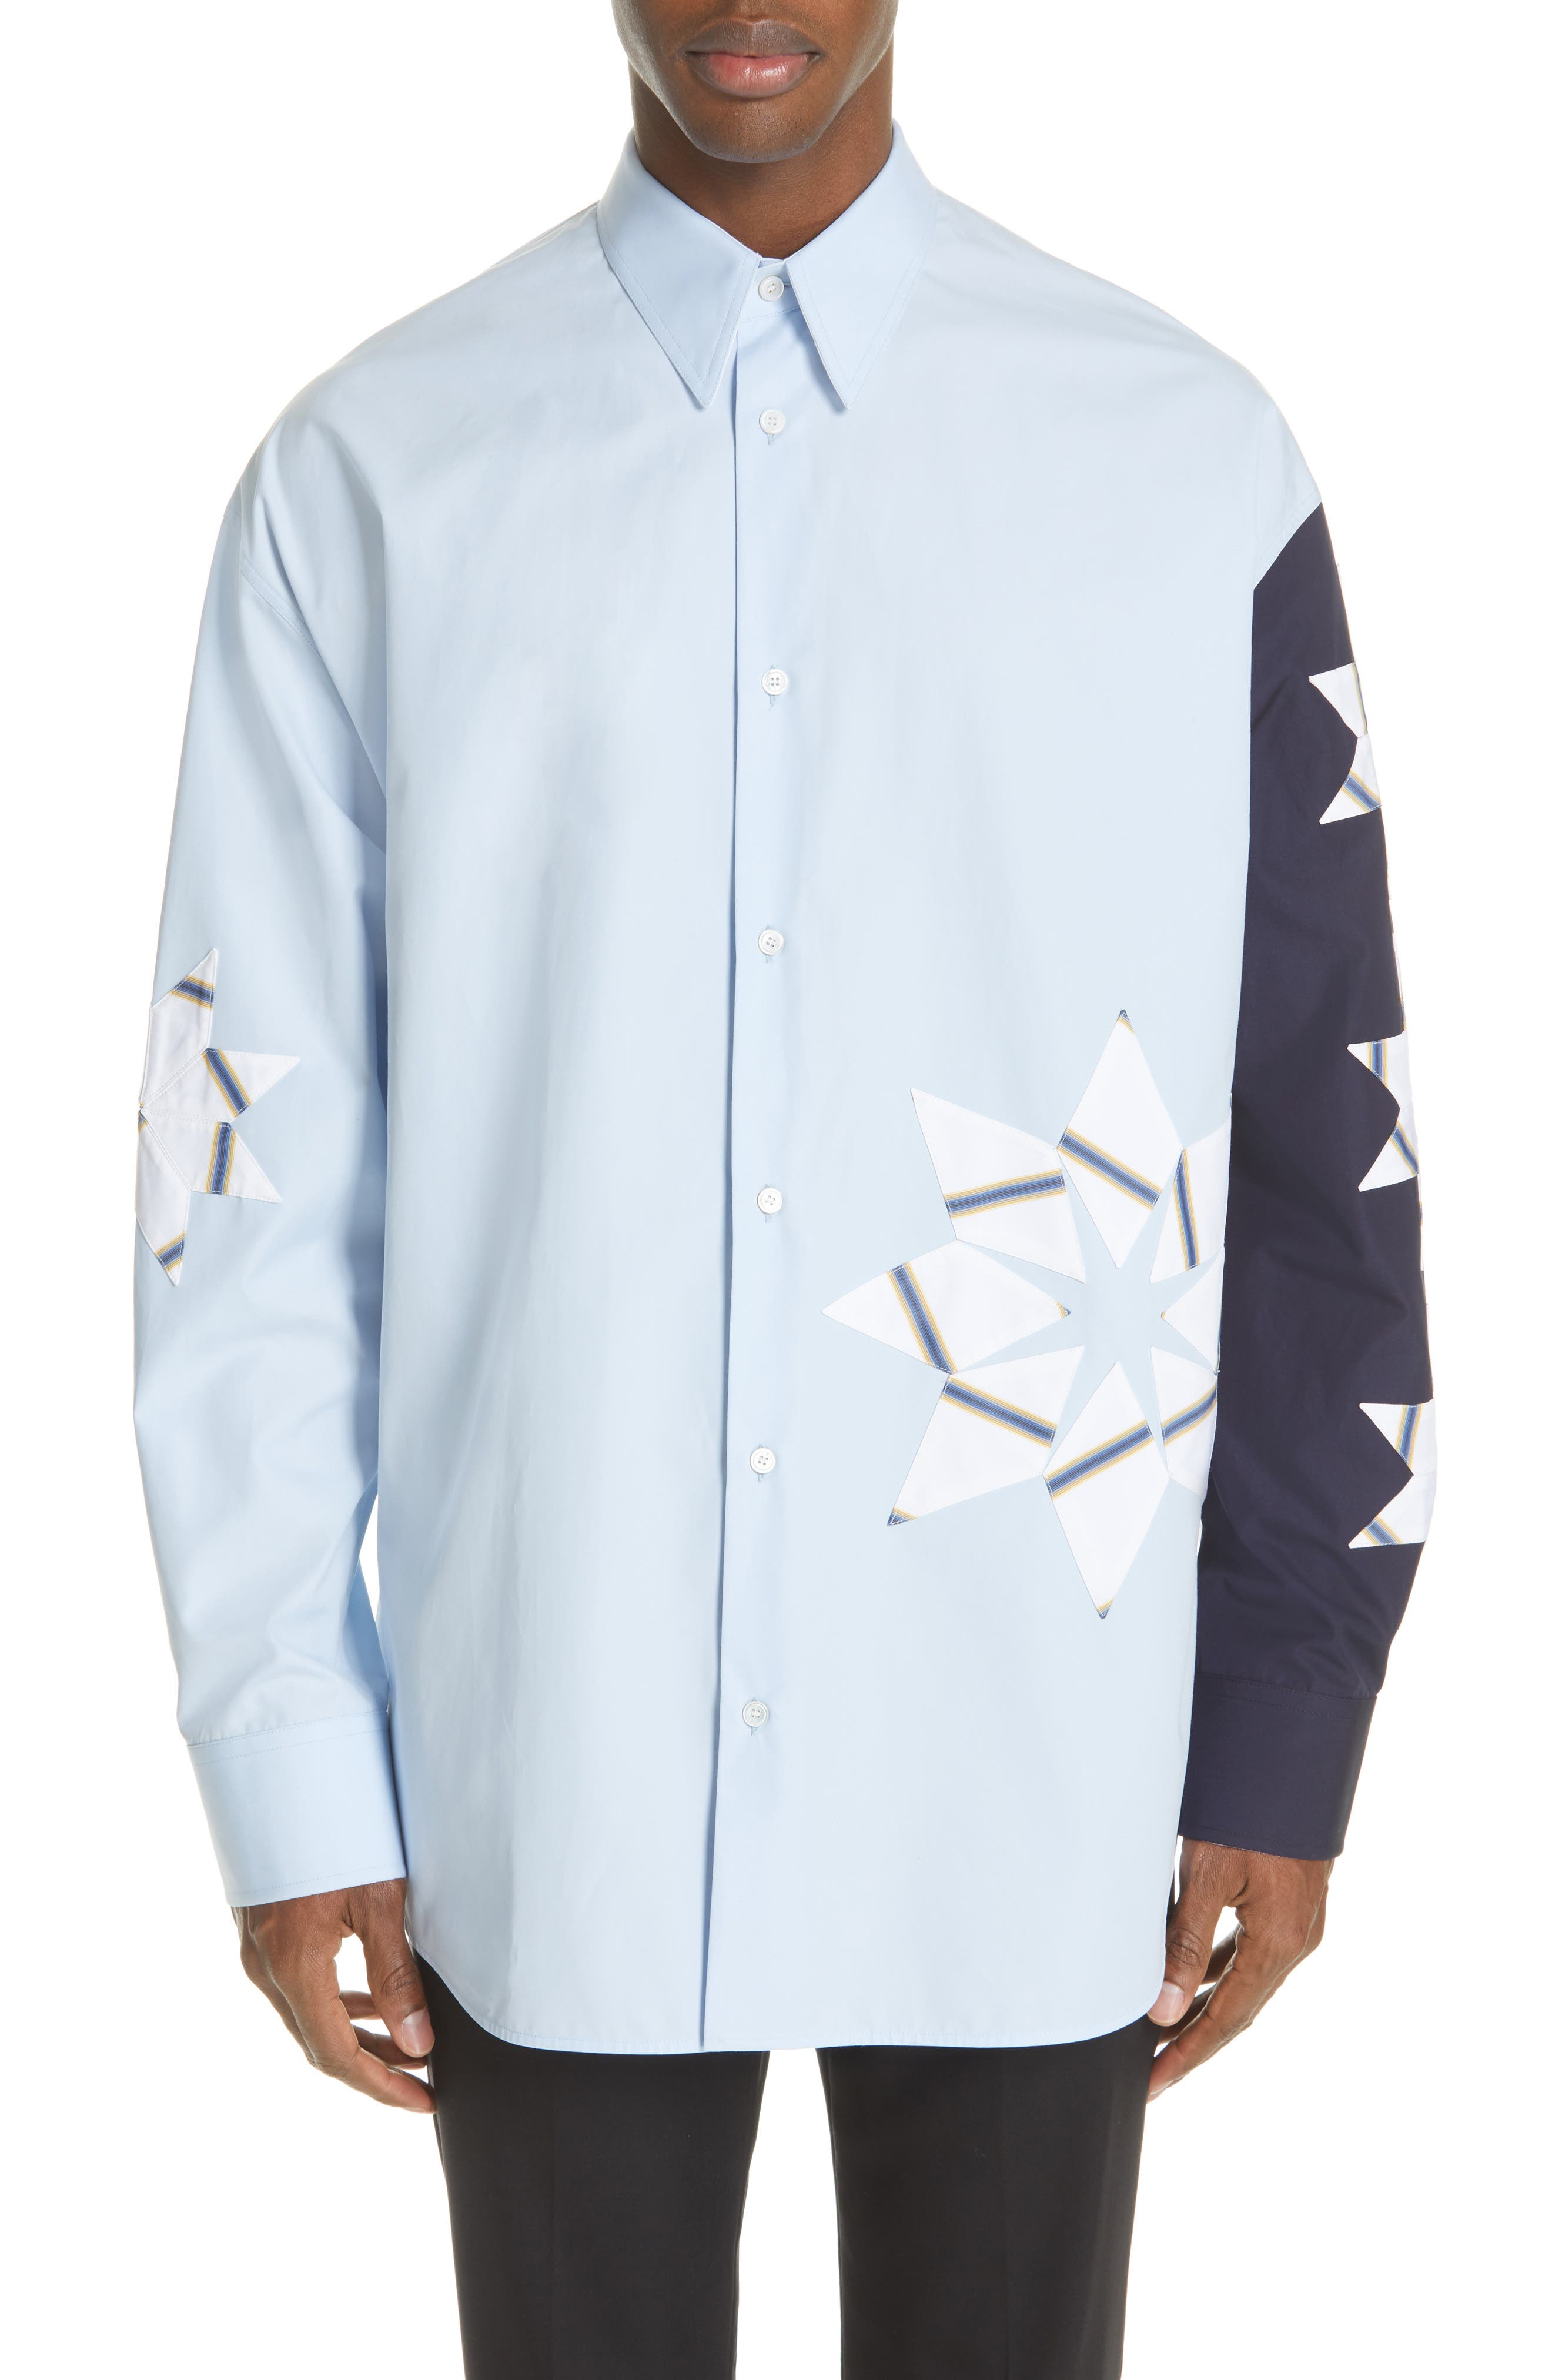 CALVIN KLEIN 205W39NYC Pinwheel Sport Shirt, Main, color, LIGHT SKY MARINE